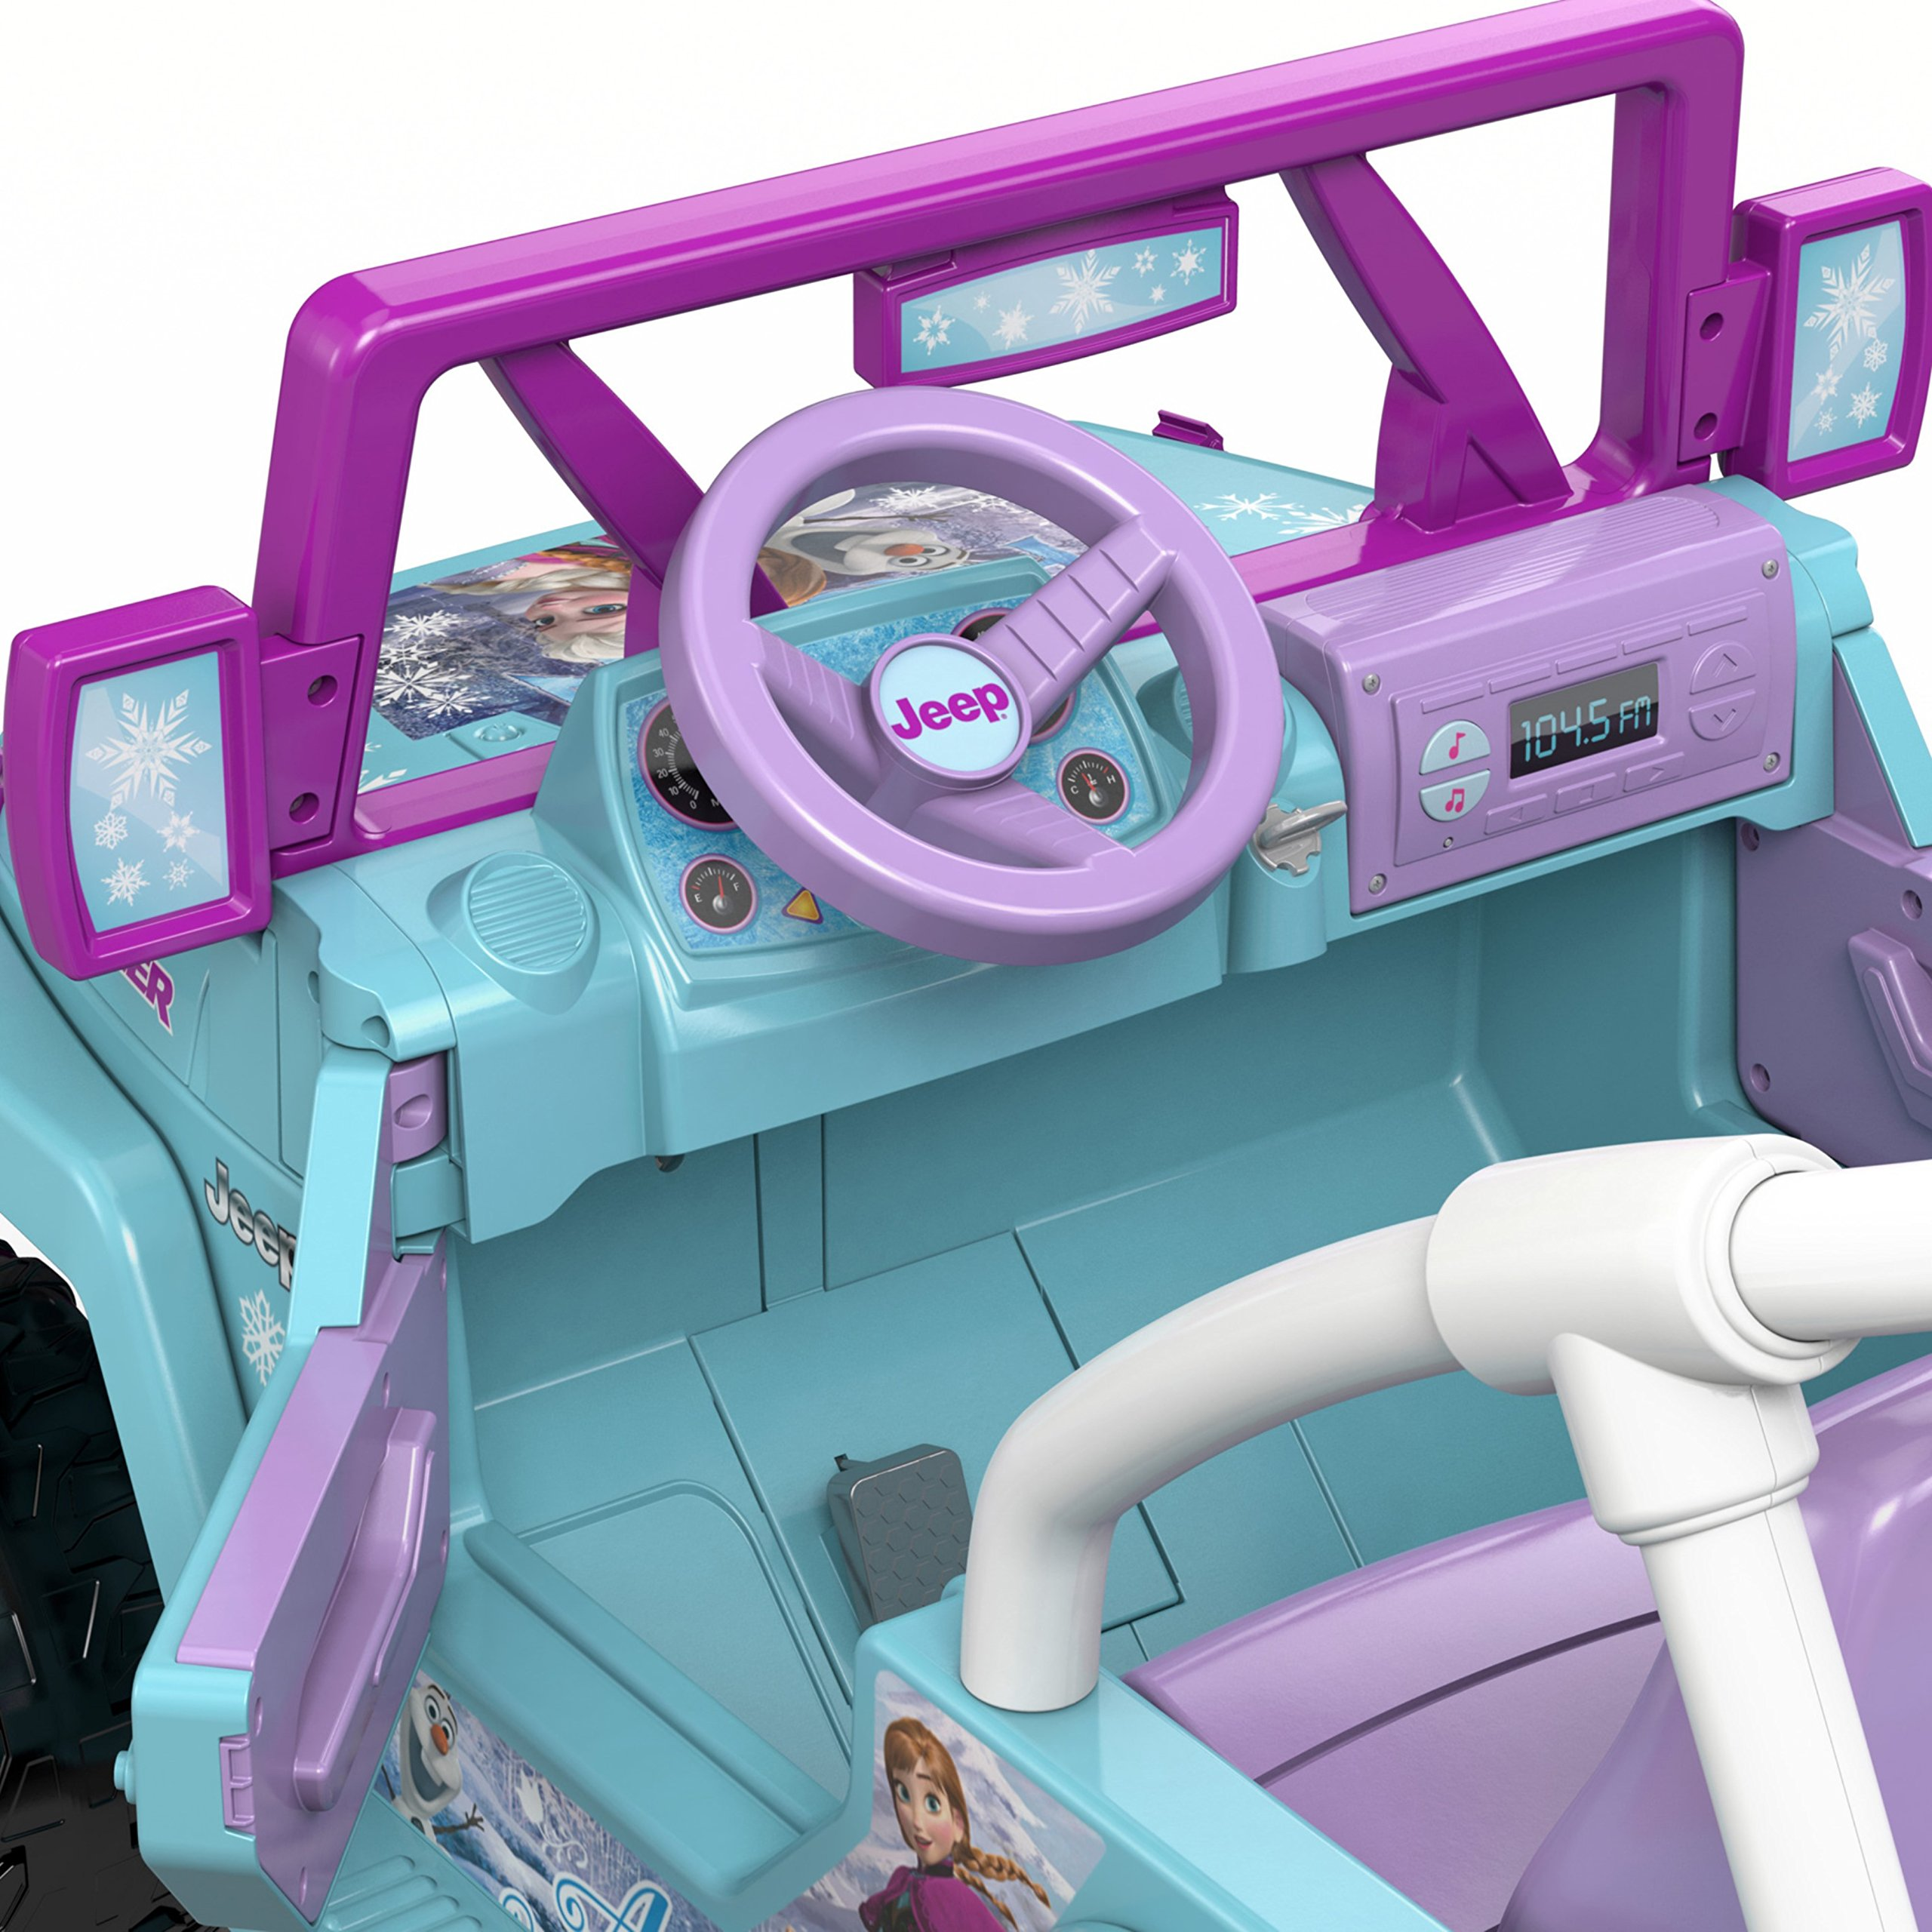 Power Wheels Disney Frozen Jeep Wrangler by Fisher-Price (Image #13)